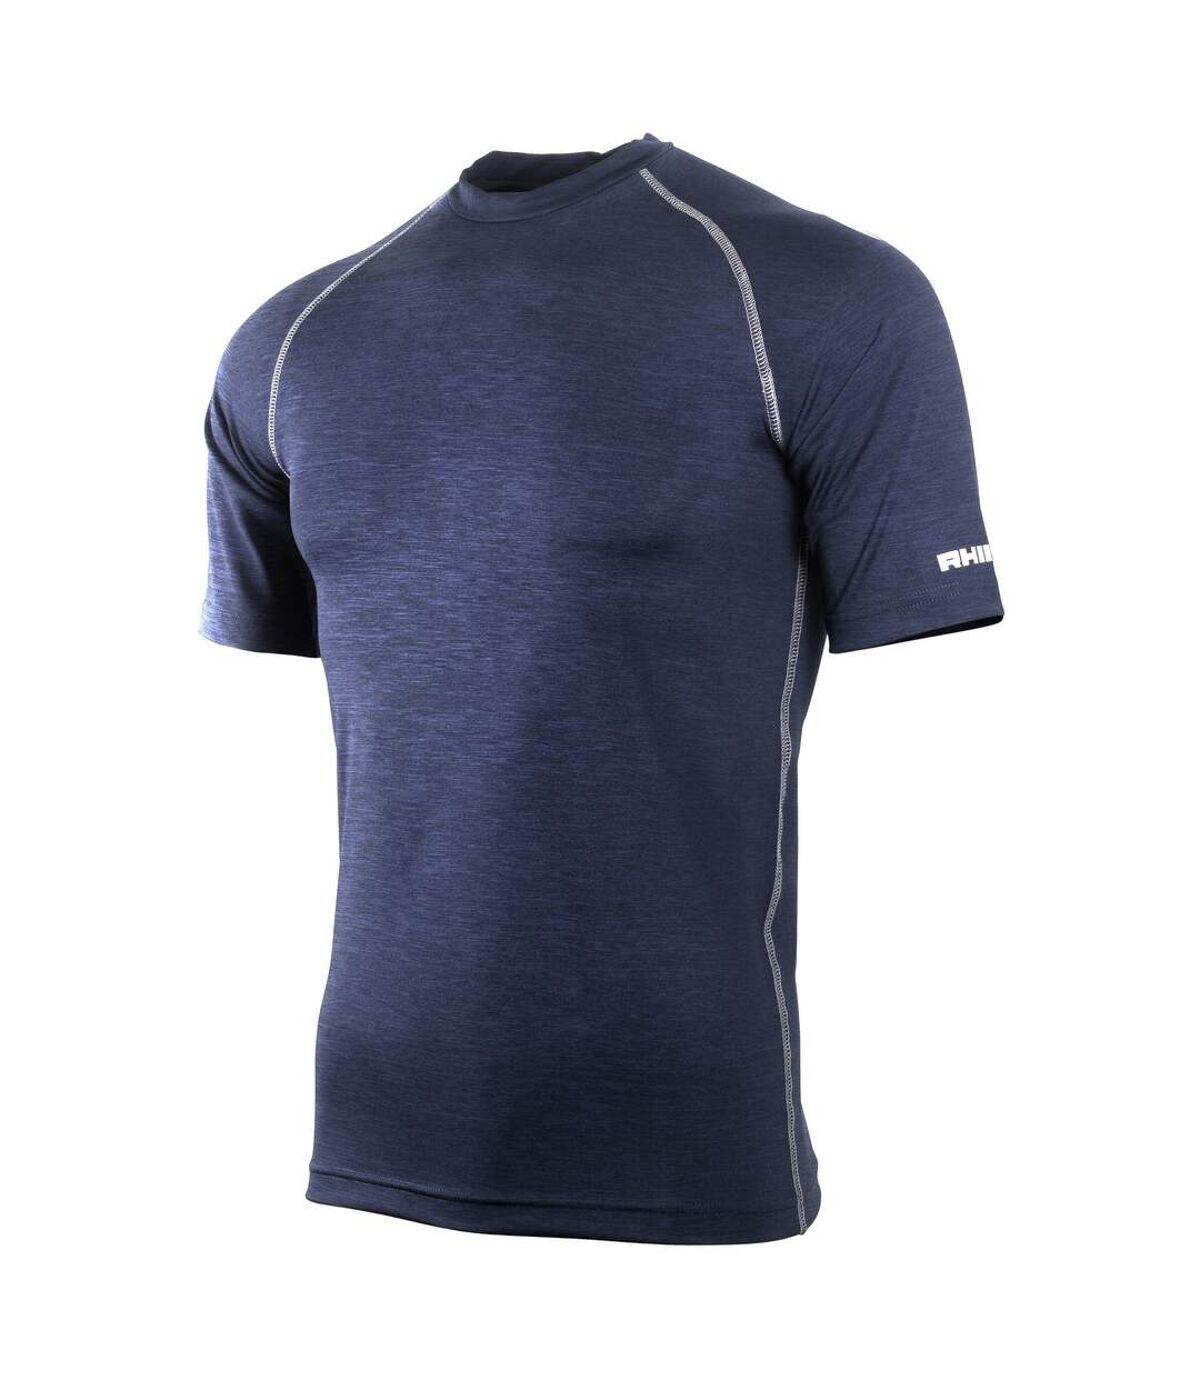 Rhino - Base layer sport à manches courtes - Homme (Bleu marine chiné) - UTRW1277